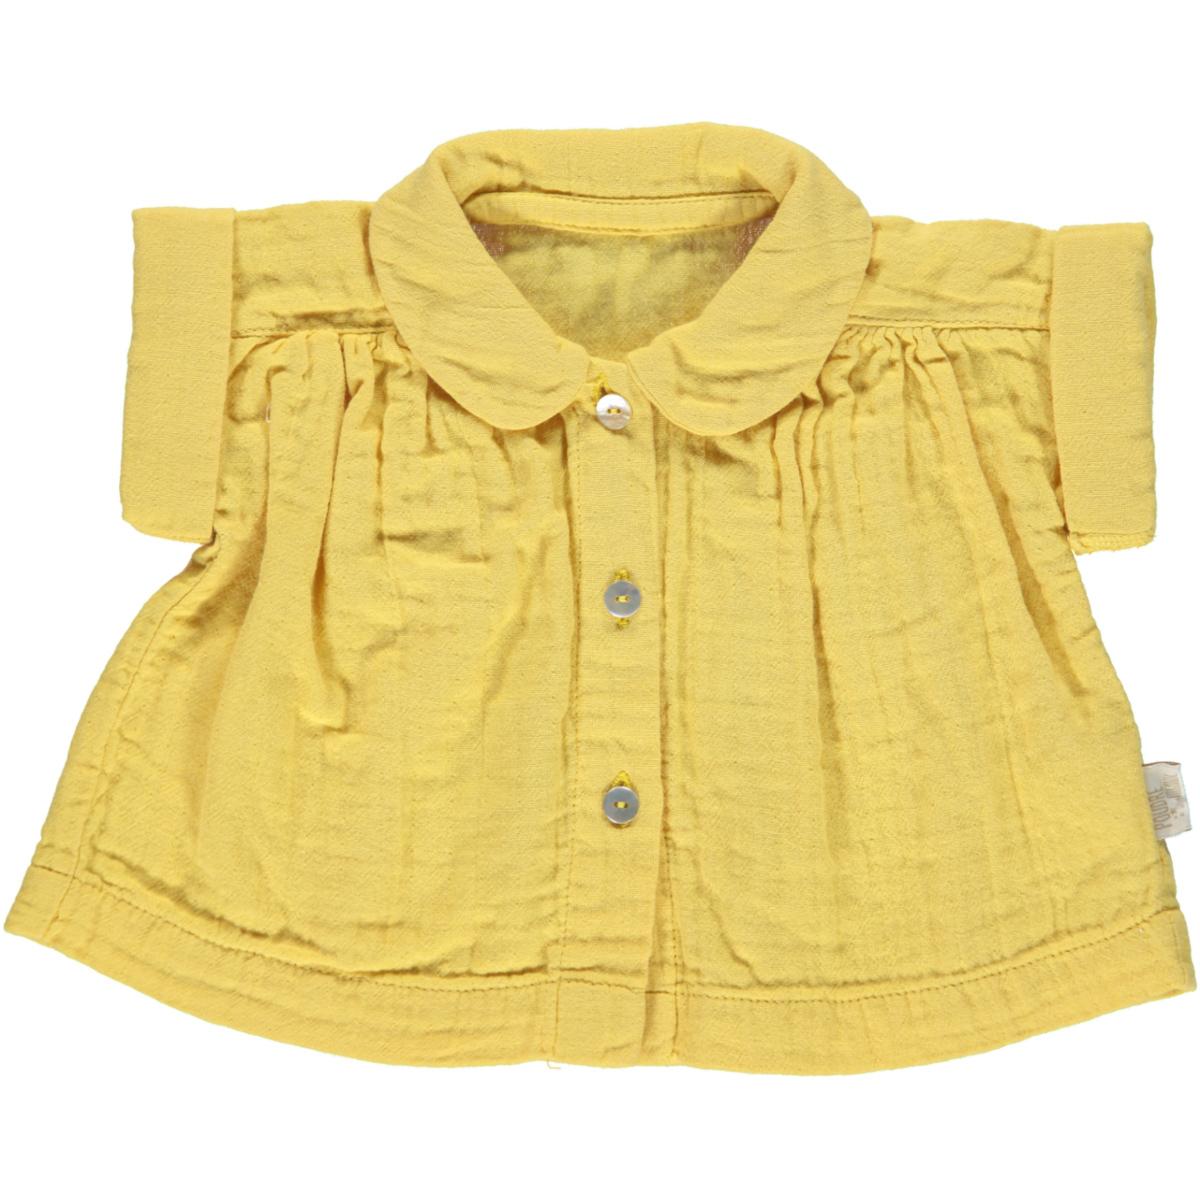 Hauts bébé Blouse MC Col Arrondi - Cream Gold - 3 mois Blouse MC Col Arrondi - Cream Gold - 3 mois